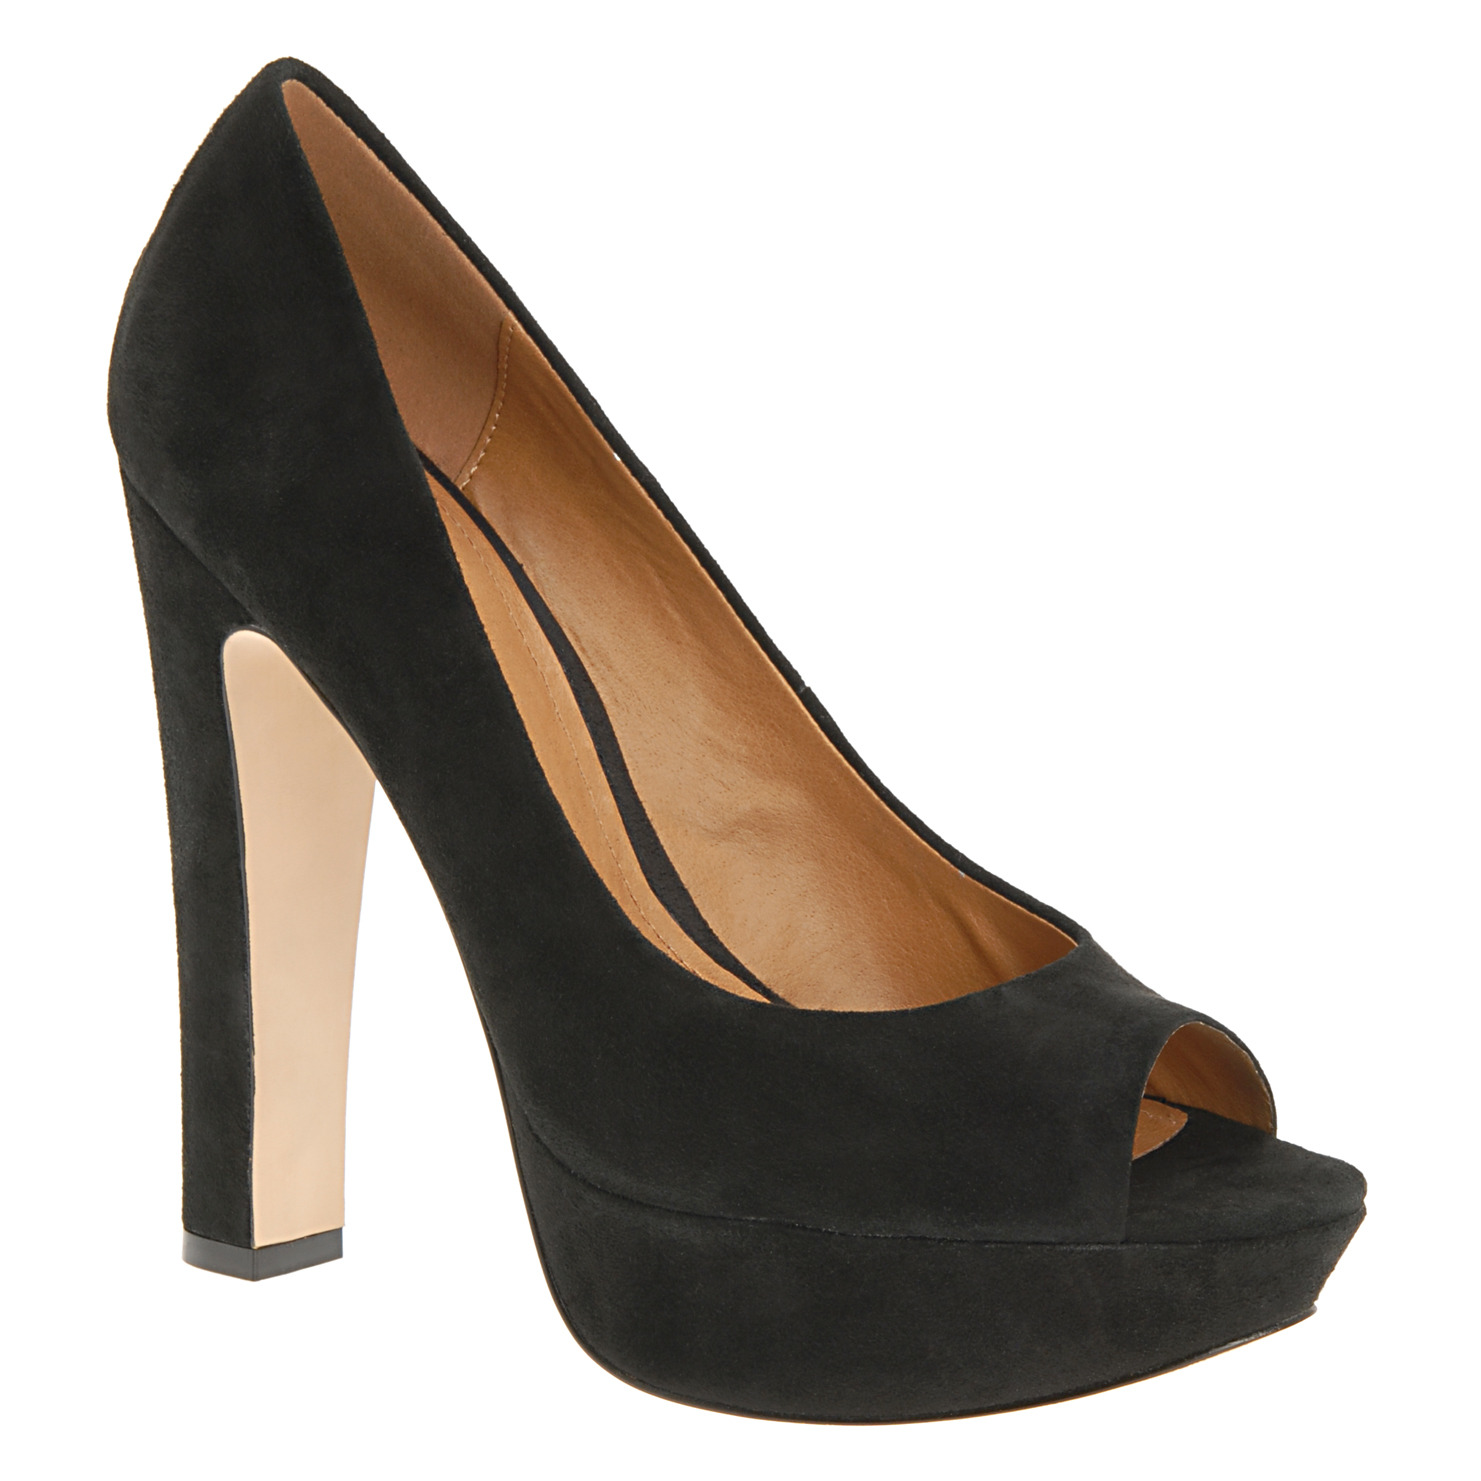 Buy Aldo Shoes Onine